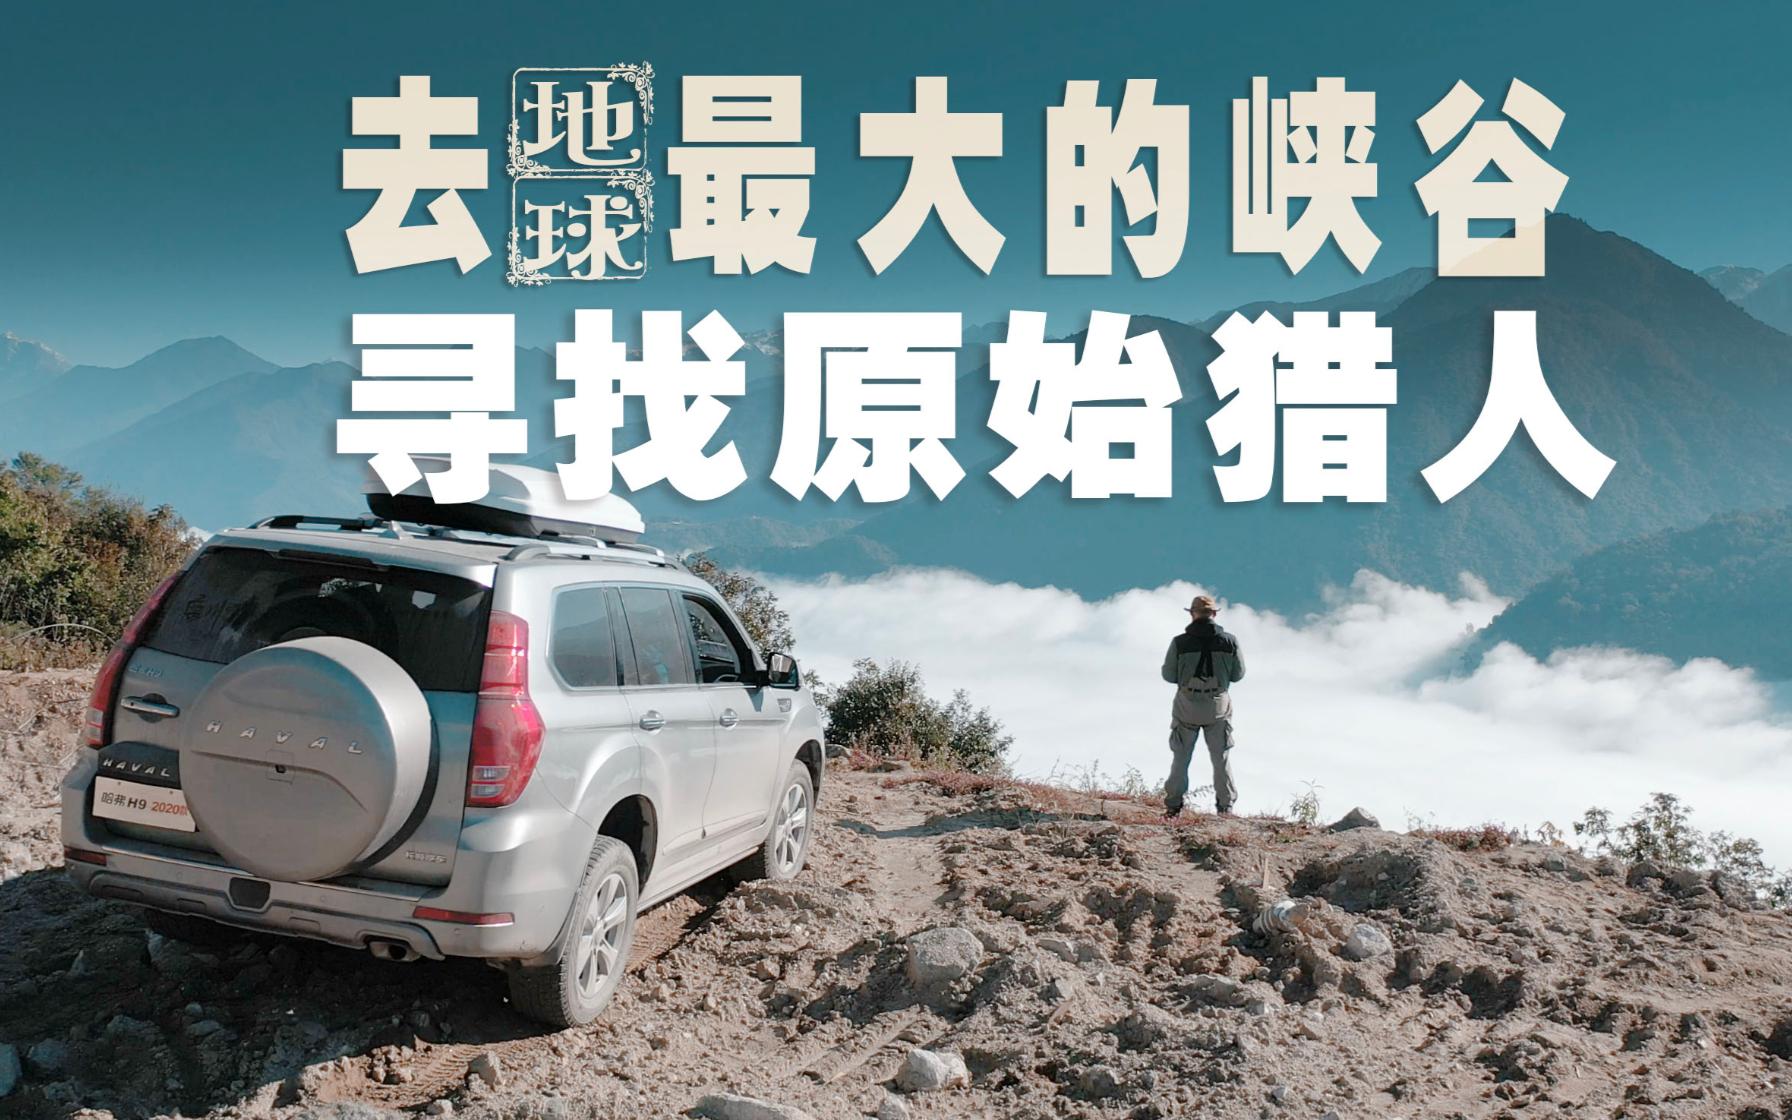 【A站首发】探寻高原秘境 | 去地球上最大的峡谷寻找原始猎人